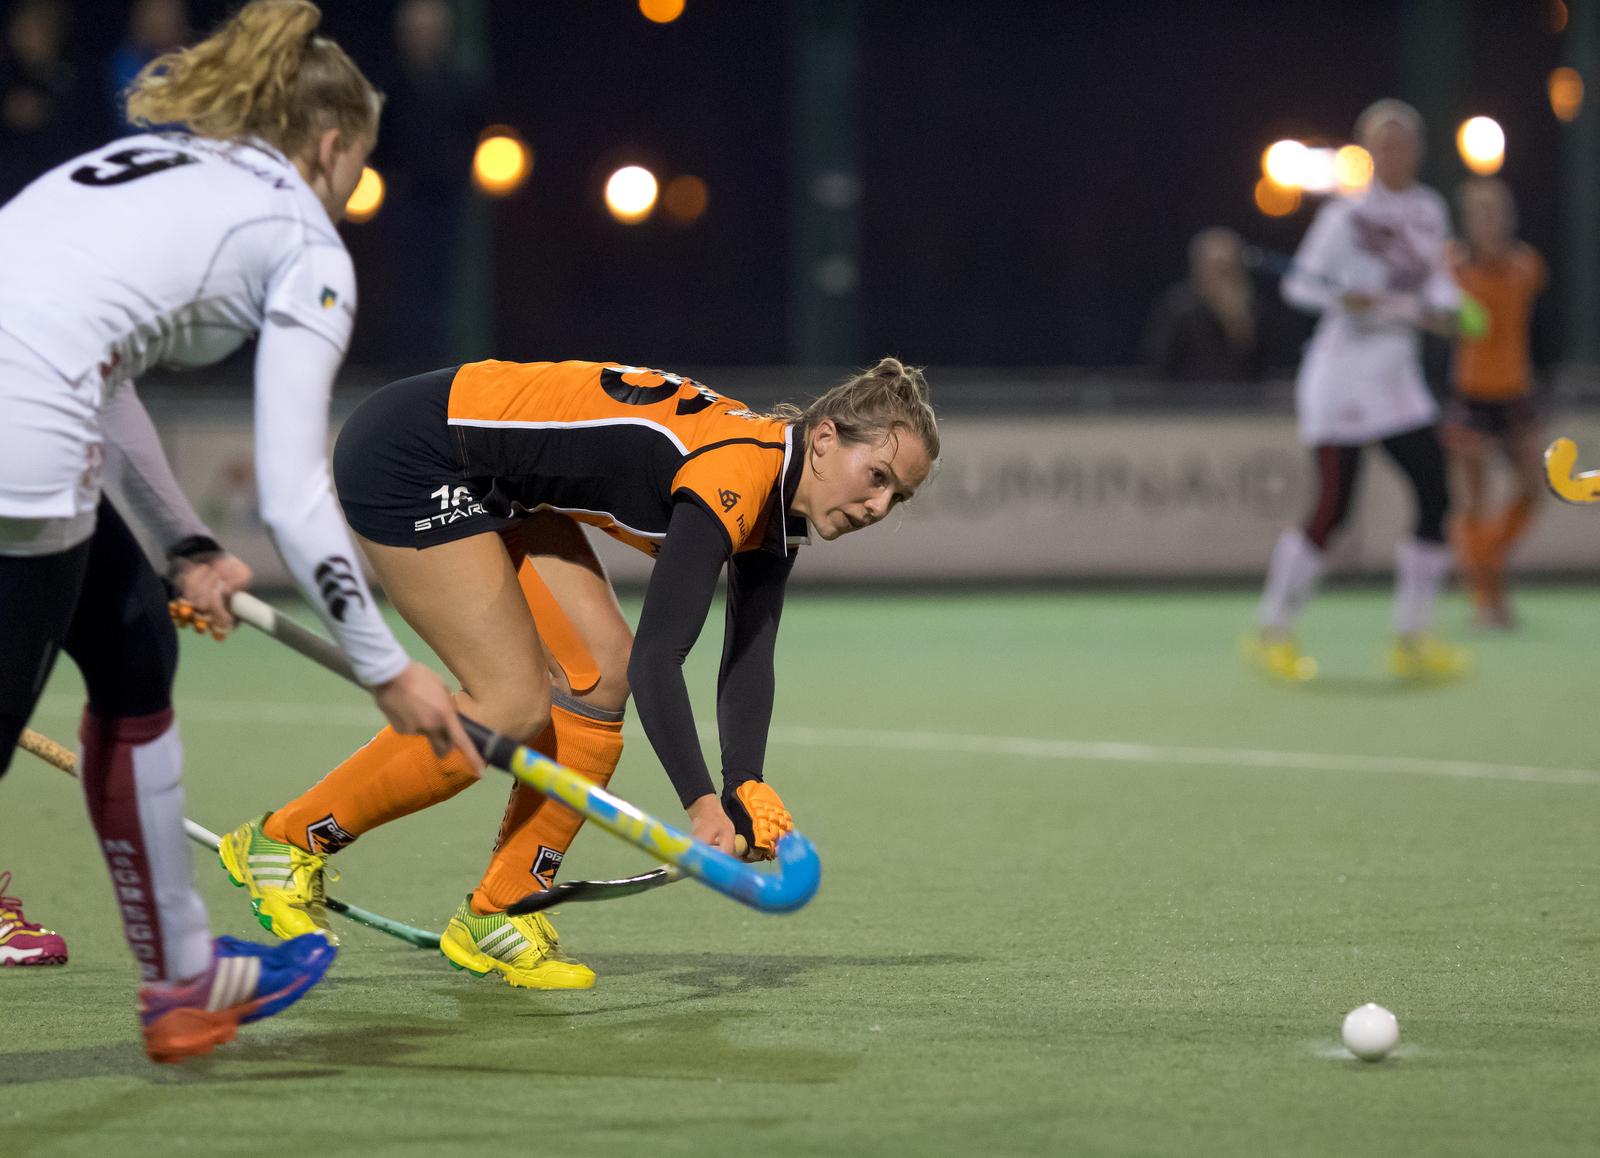 OZ-Amsterdam-dames-RU Charlotte Derkx